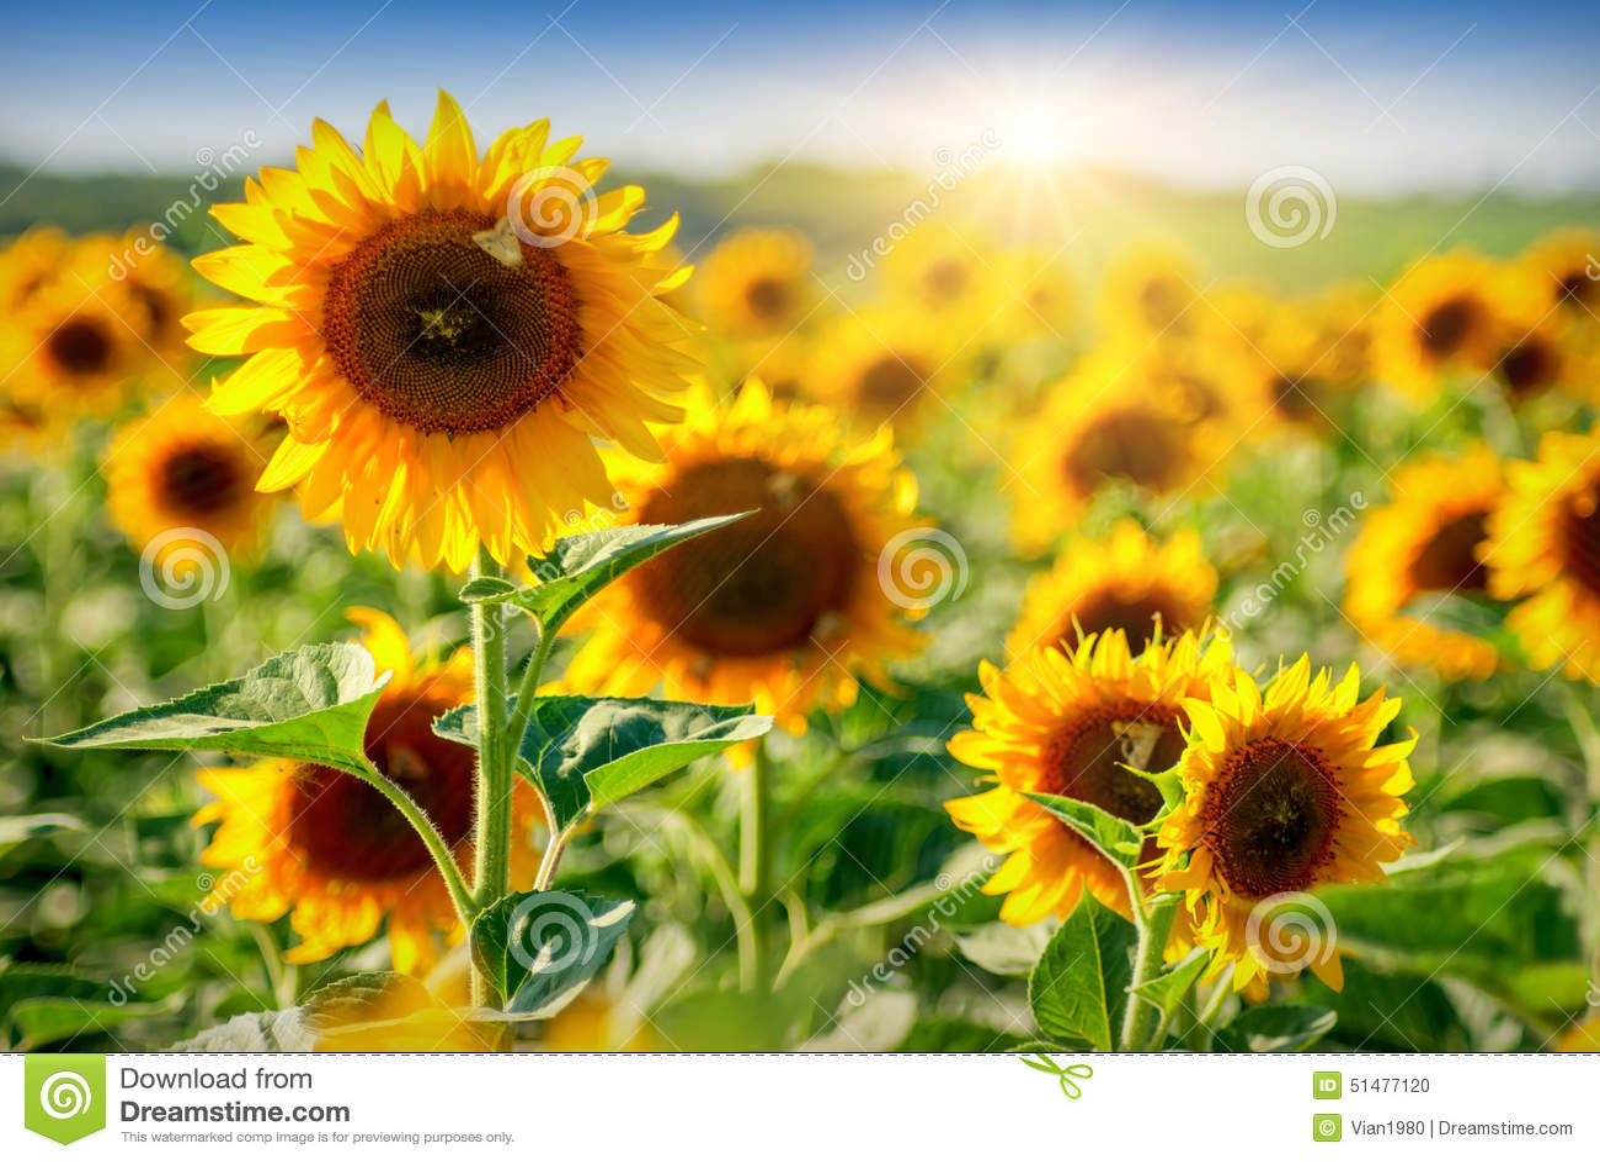 Sunflower_field 3